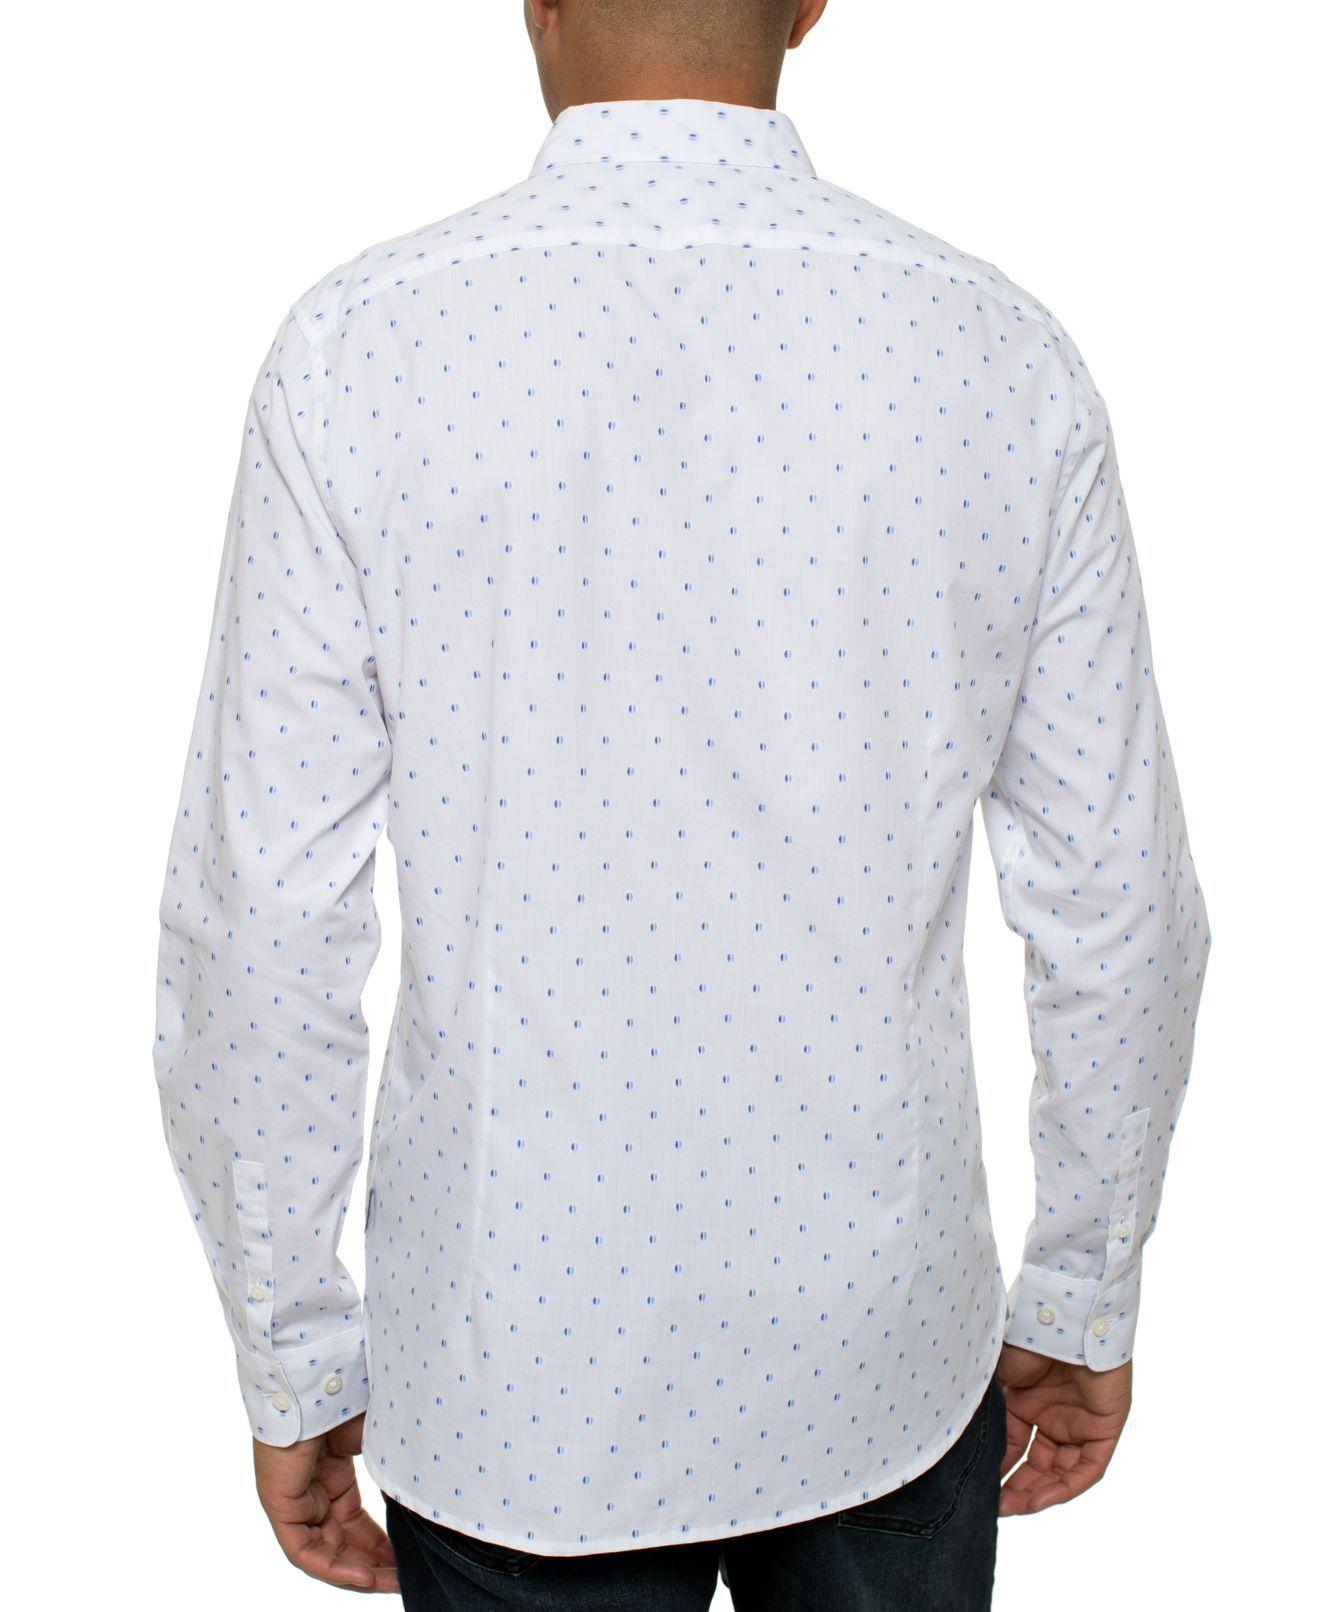 Kenneth Cole Mens Dress Shirt White Size Large L Button Down Clip Dot